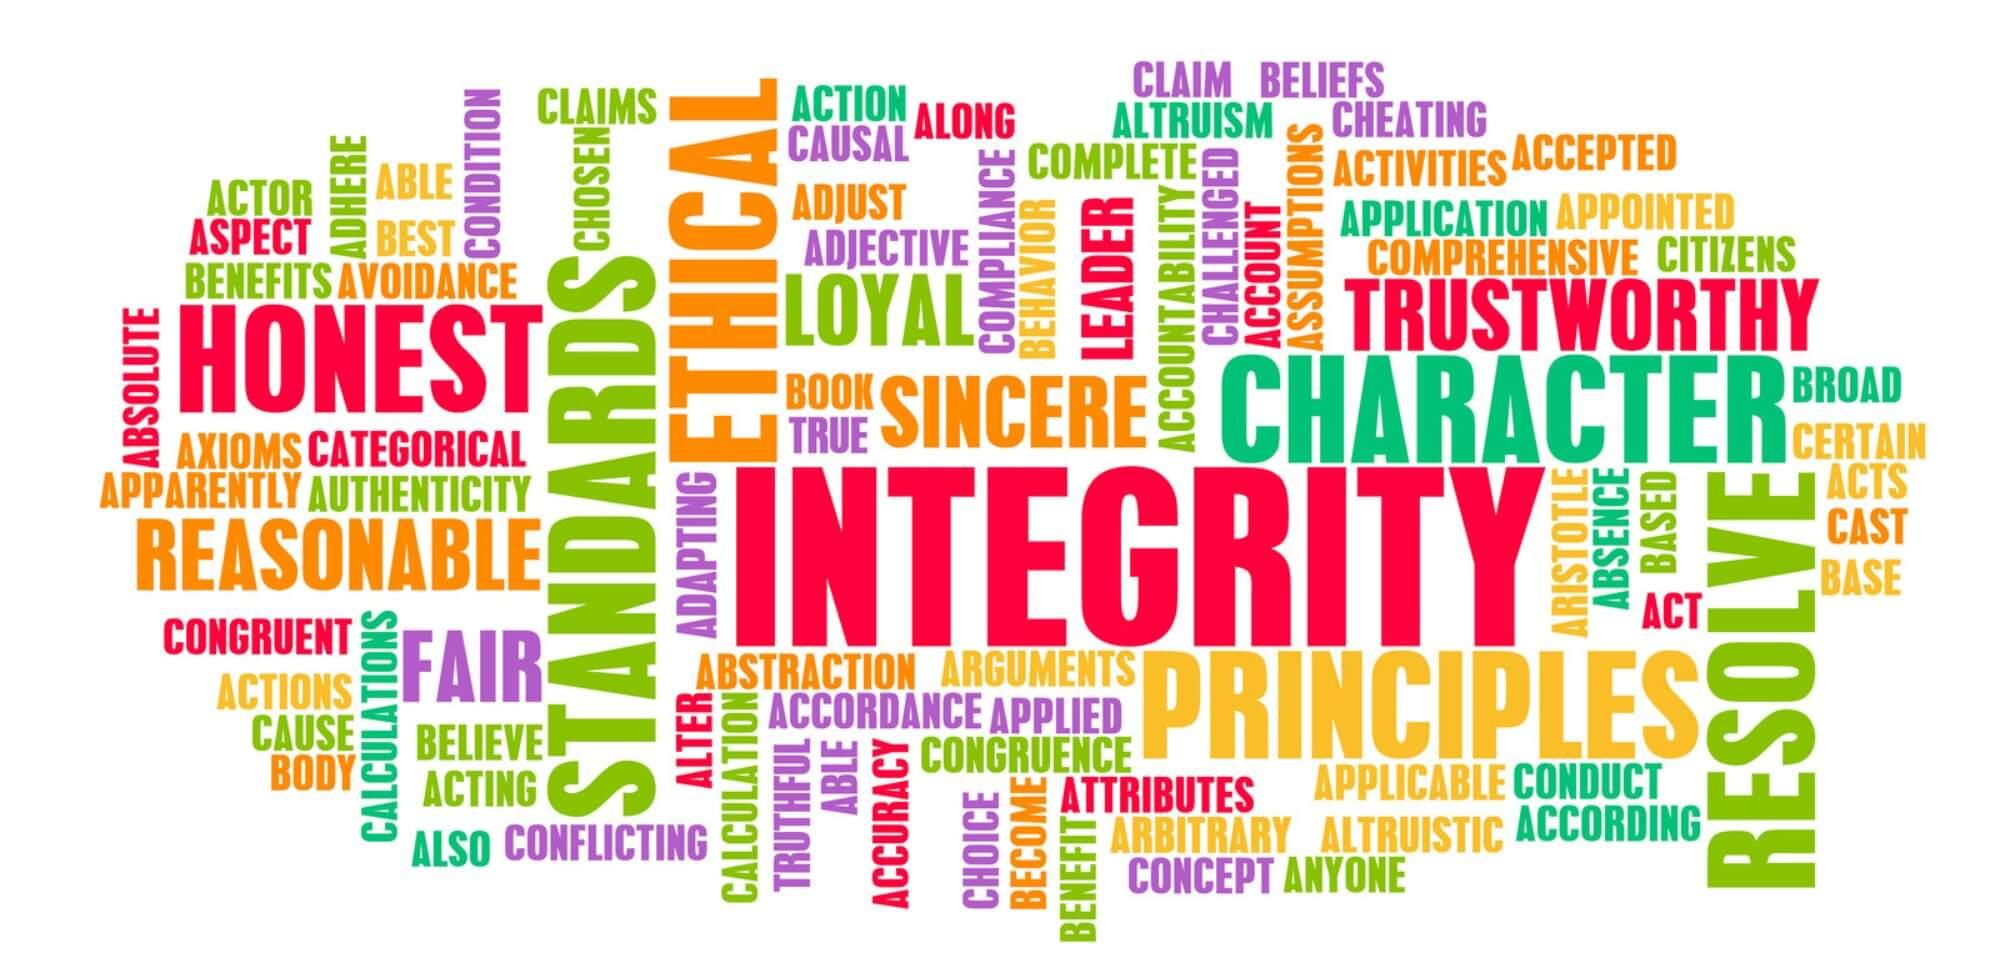 The Characteristics of an Entrepreneurial Spirit